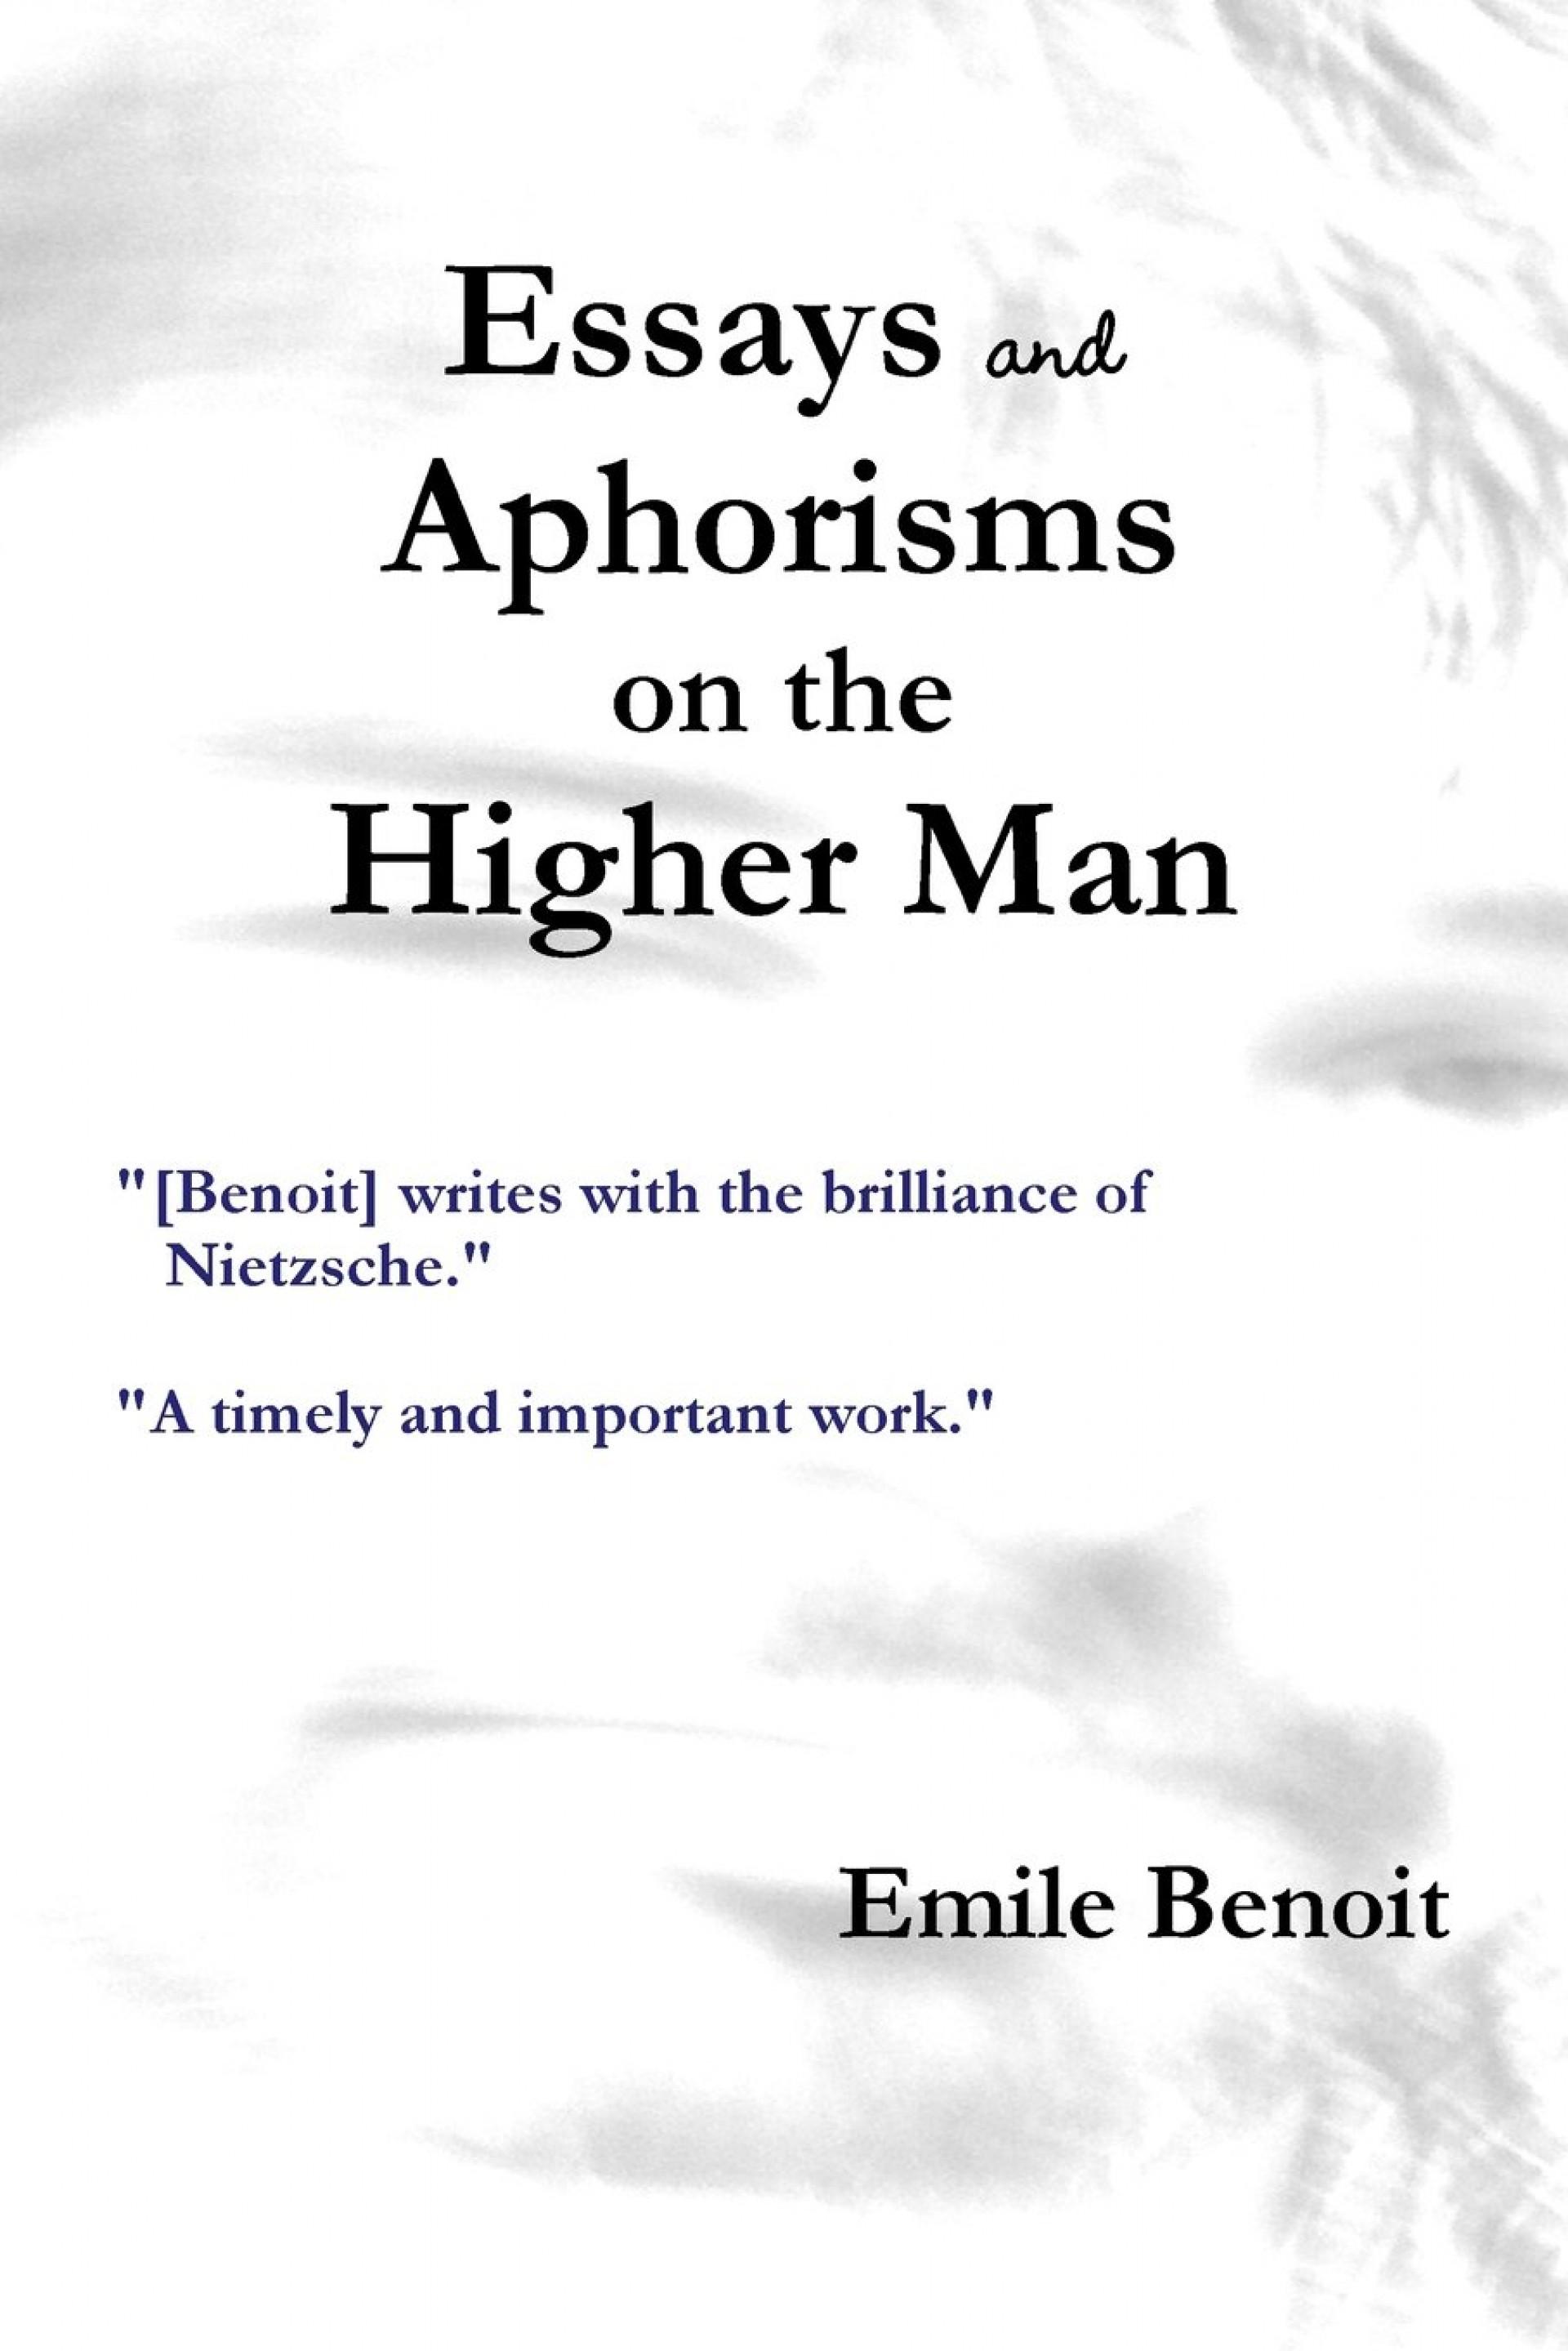 007 Essays And Aphorisms Essay Example Frightening Pdf Schopenhauer 1920